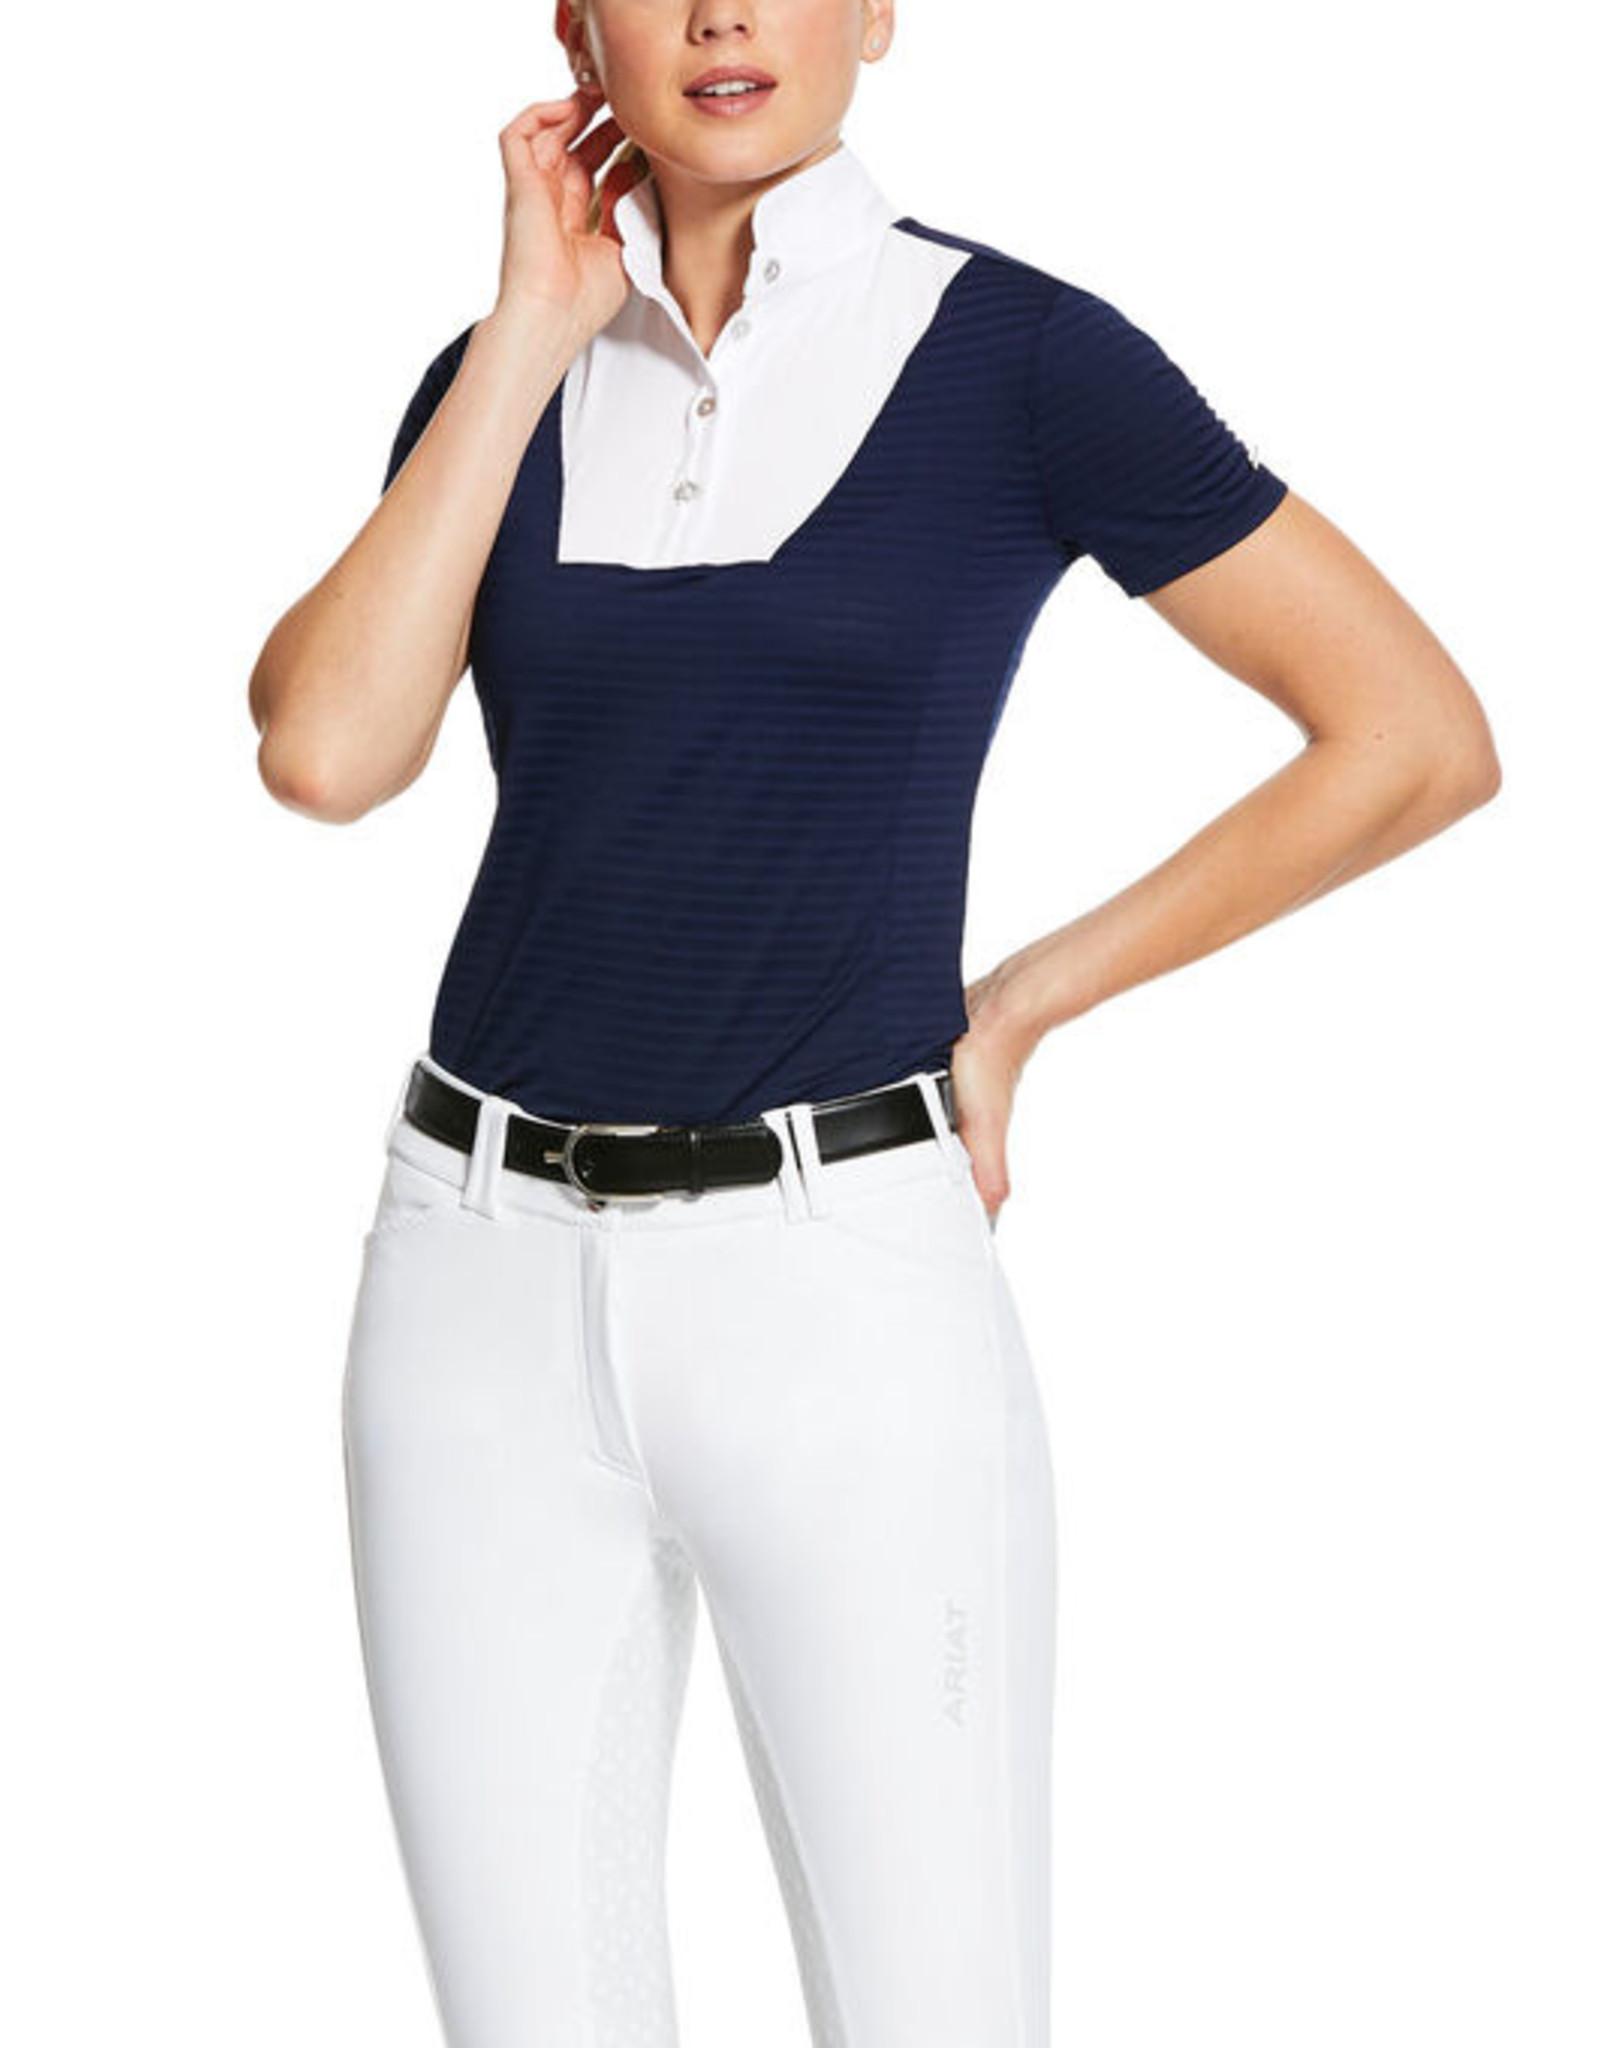 Ariat Lanni Ladies' Show Shirt